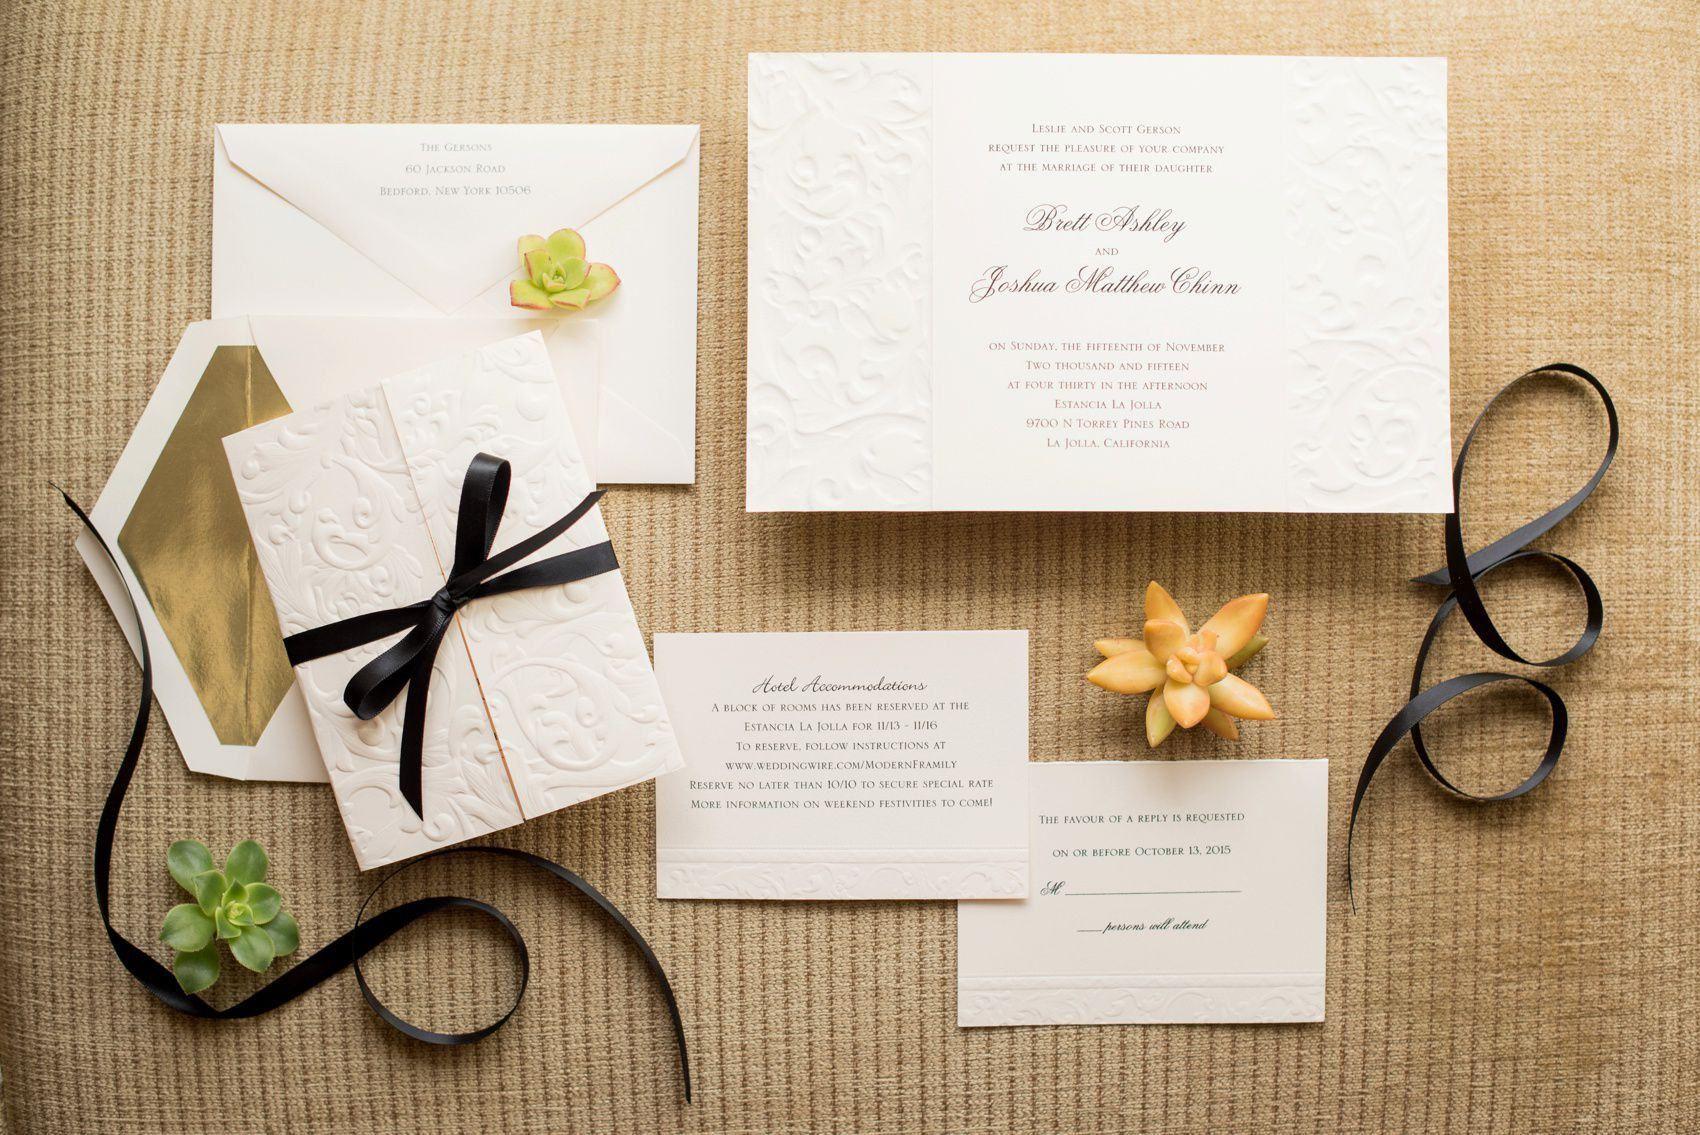 Best Wedding Invitations Ever: Best Invitation Cards : Unique Wedding Invitation Card